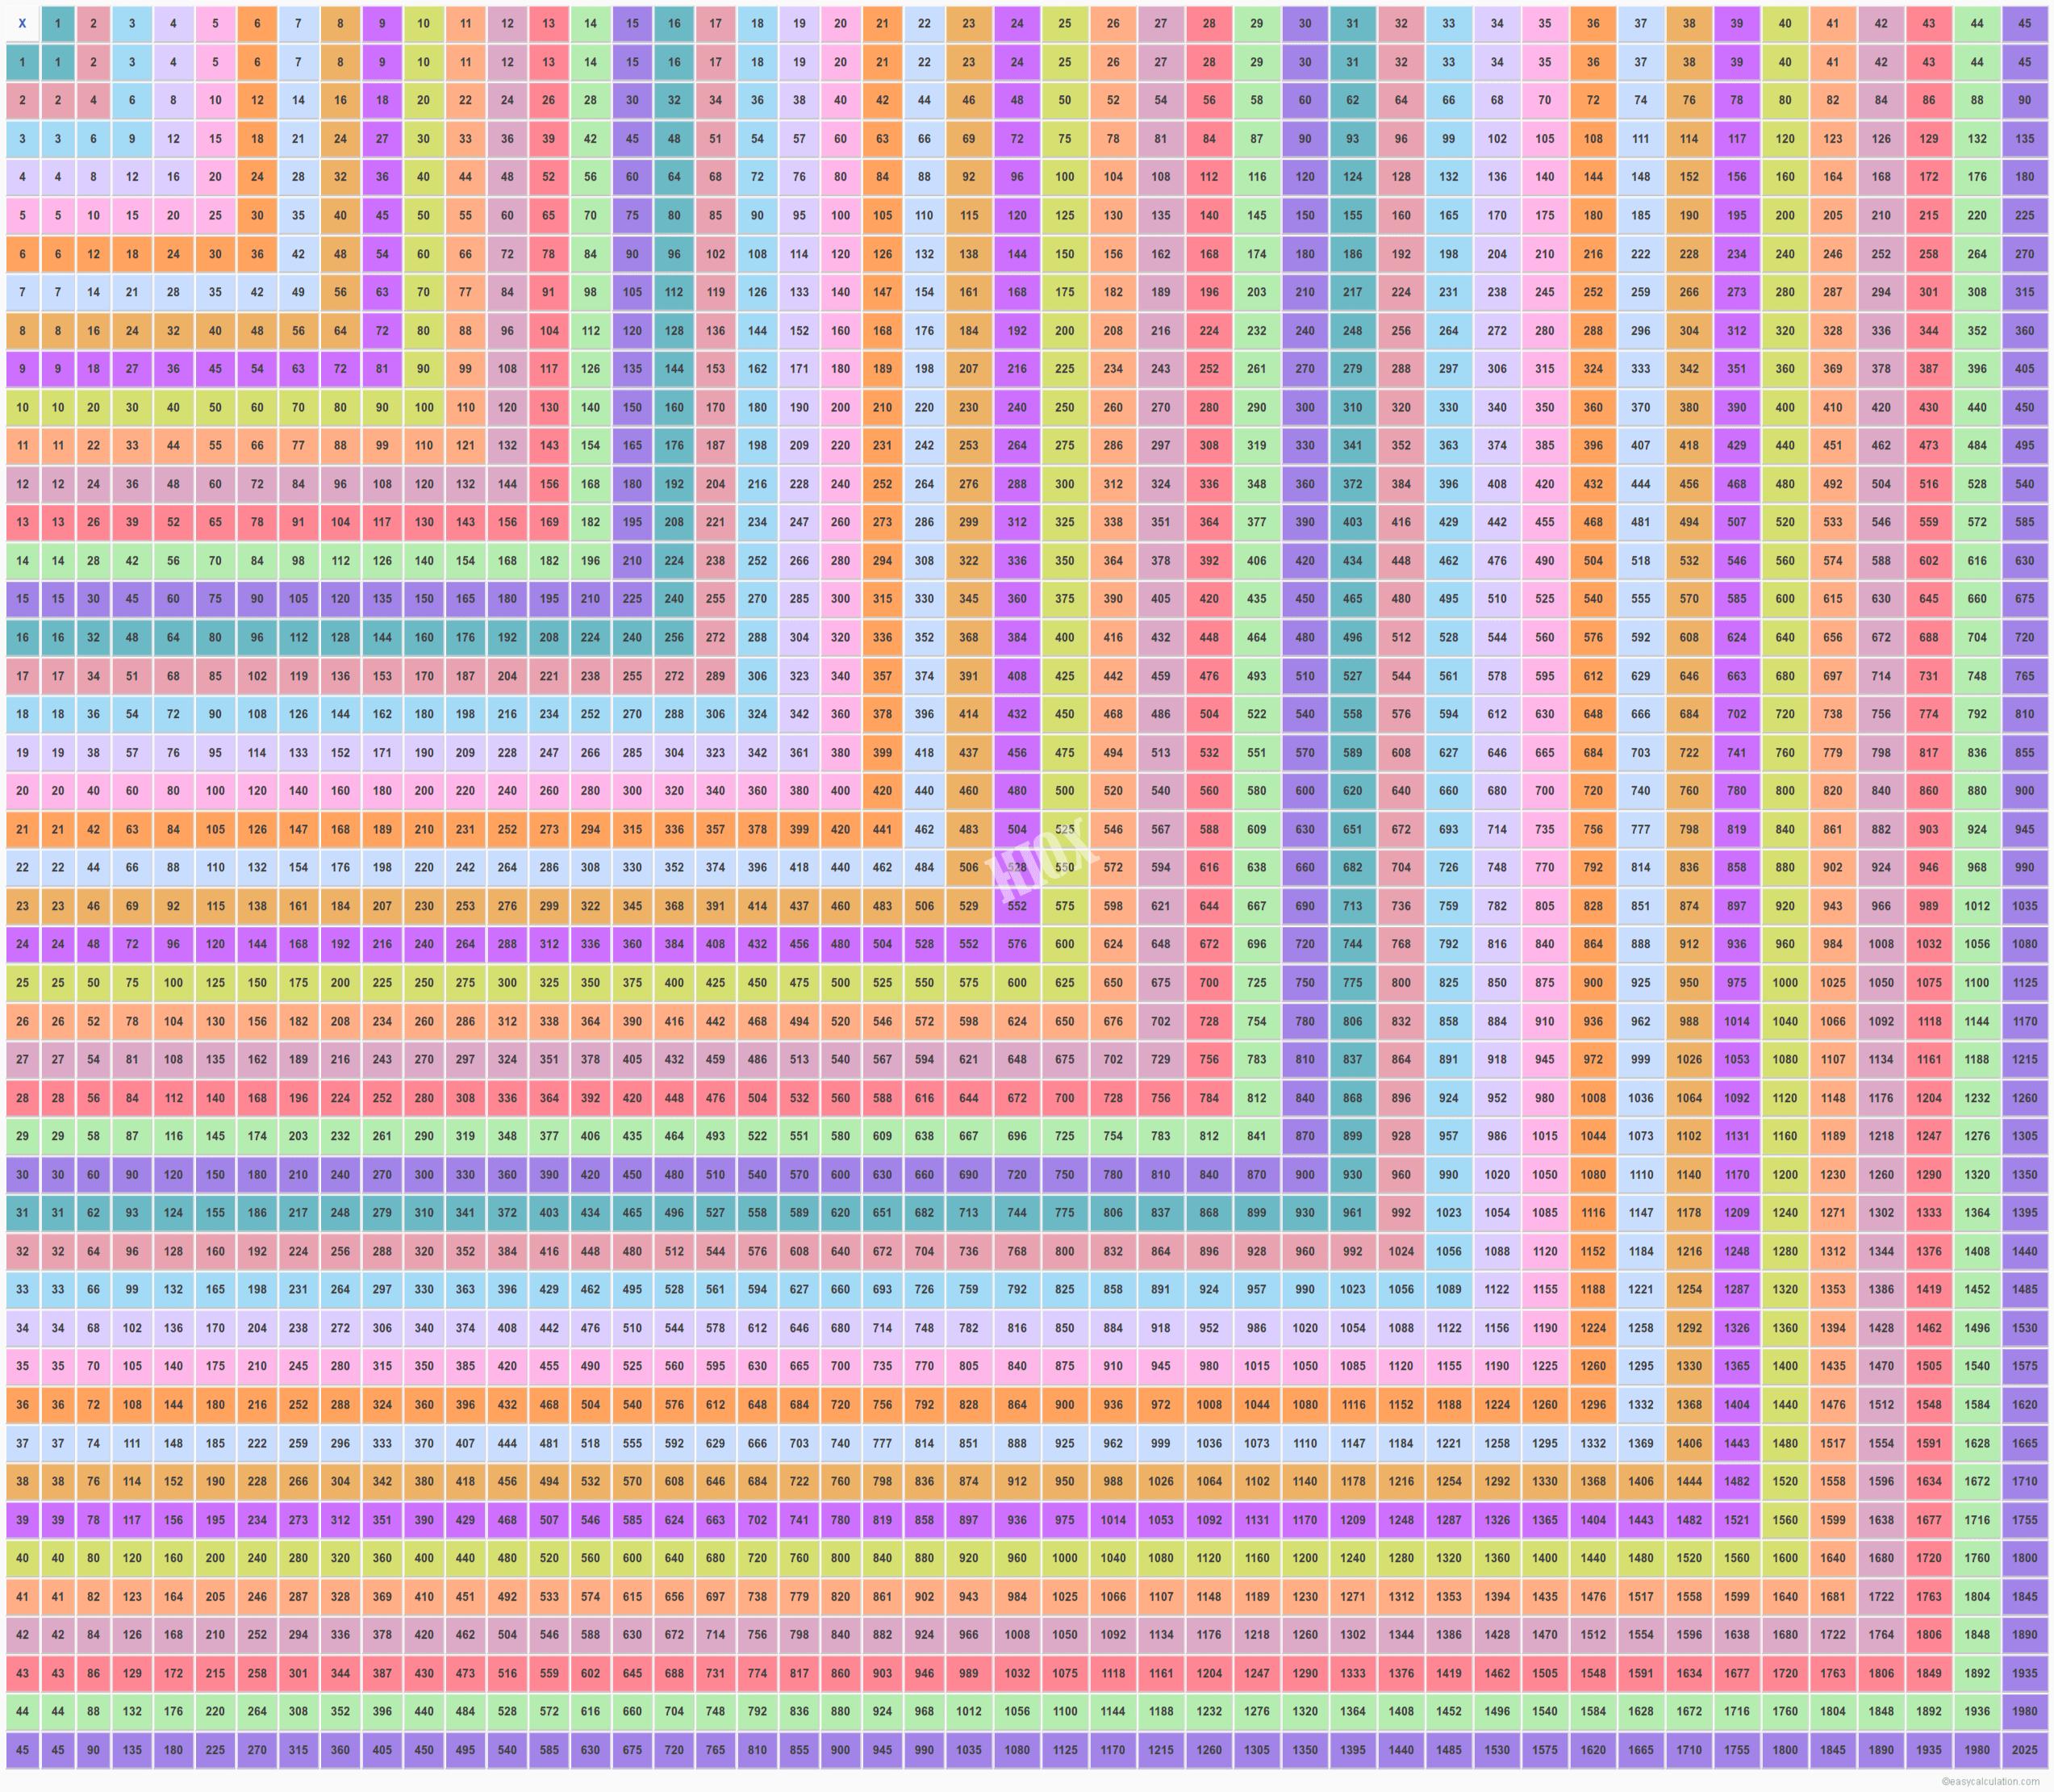 Multiplication Table 45X45 | Multiplication Chart 1-45